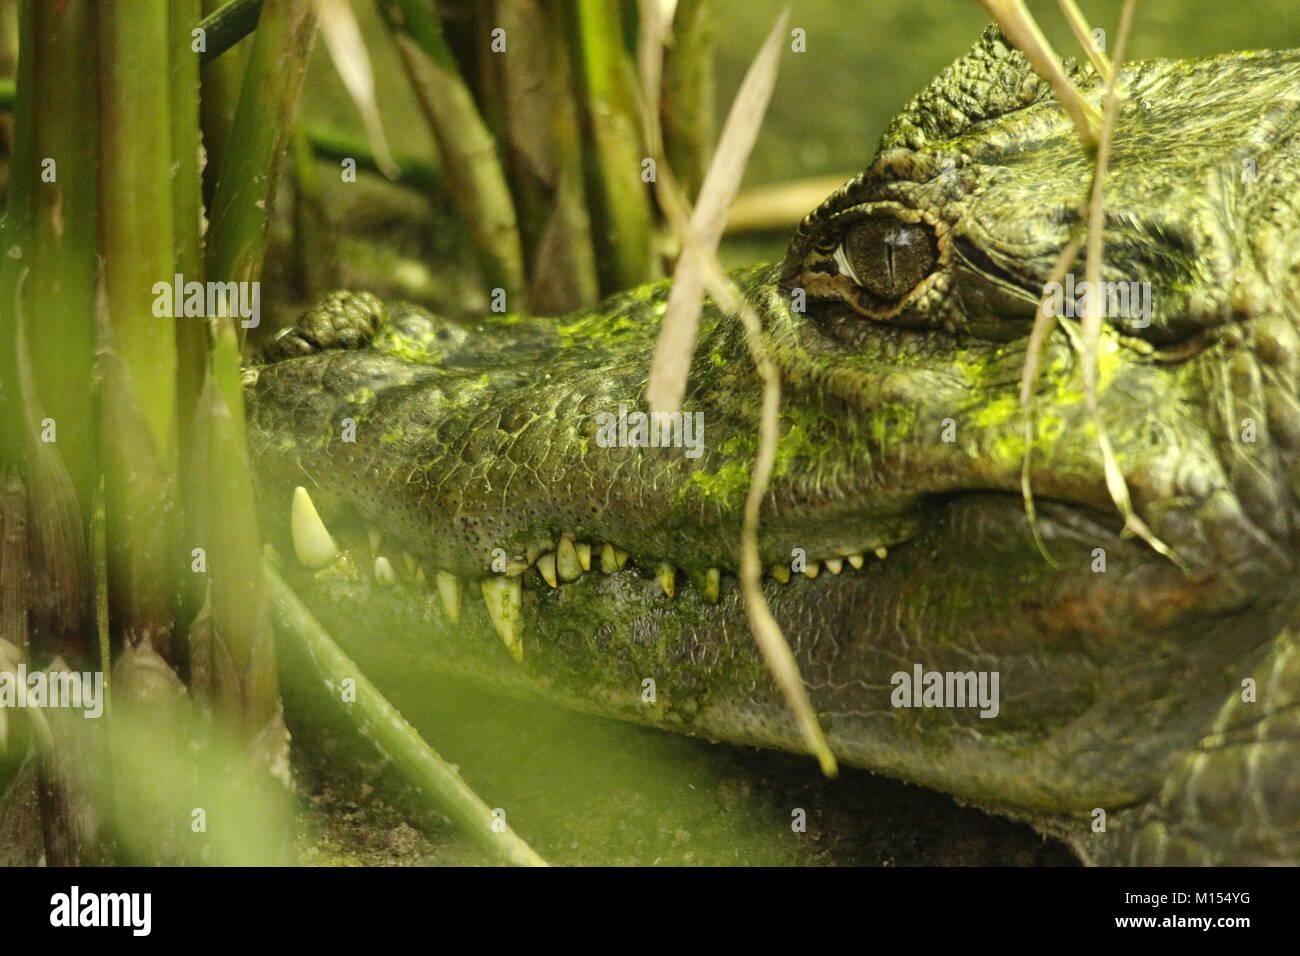 Caiman in animal park - Stock Image